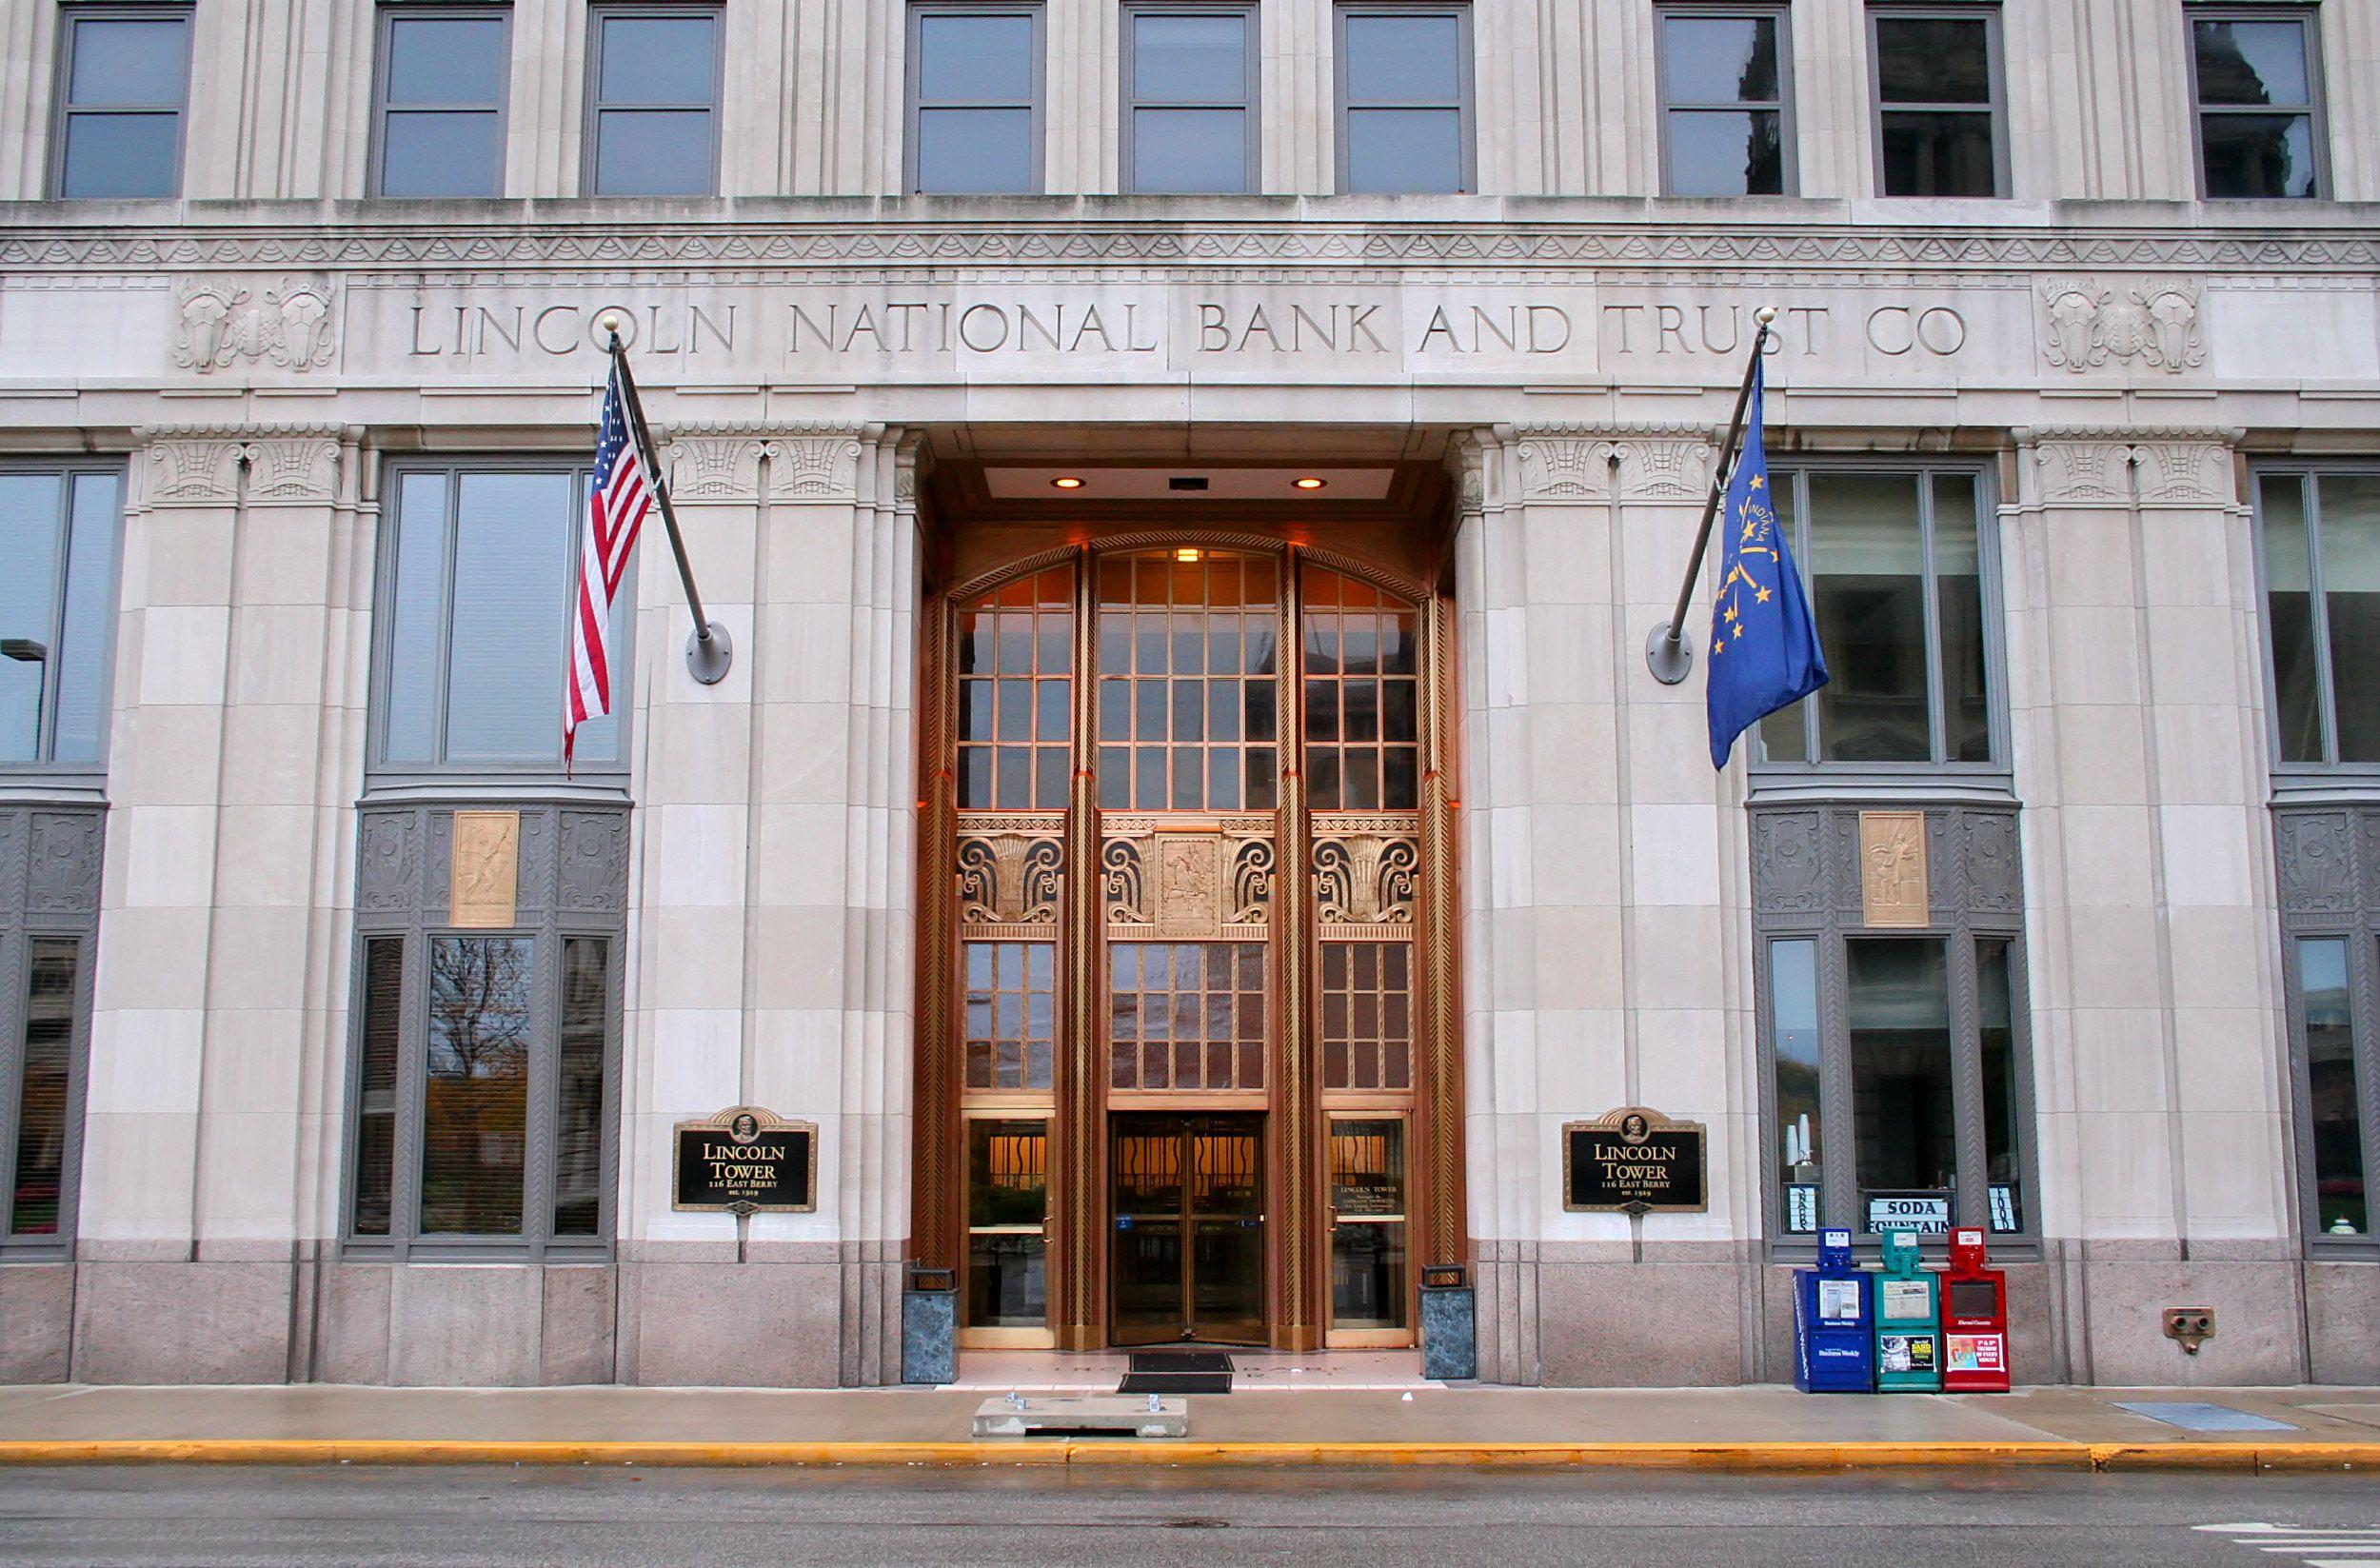 Lincoln Bank Tower Wiki Fort wayne indiana, Entrance